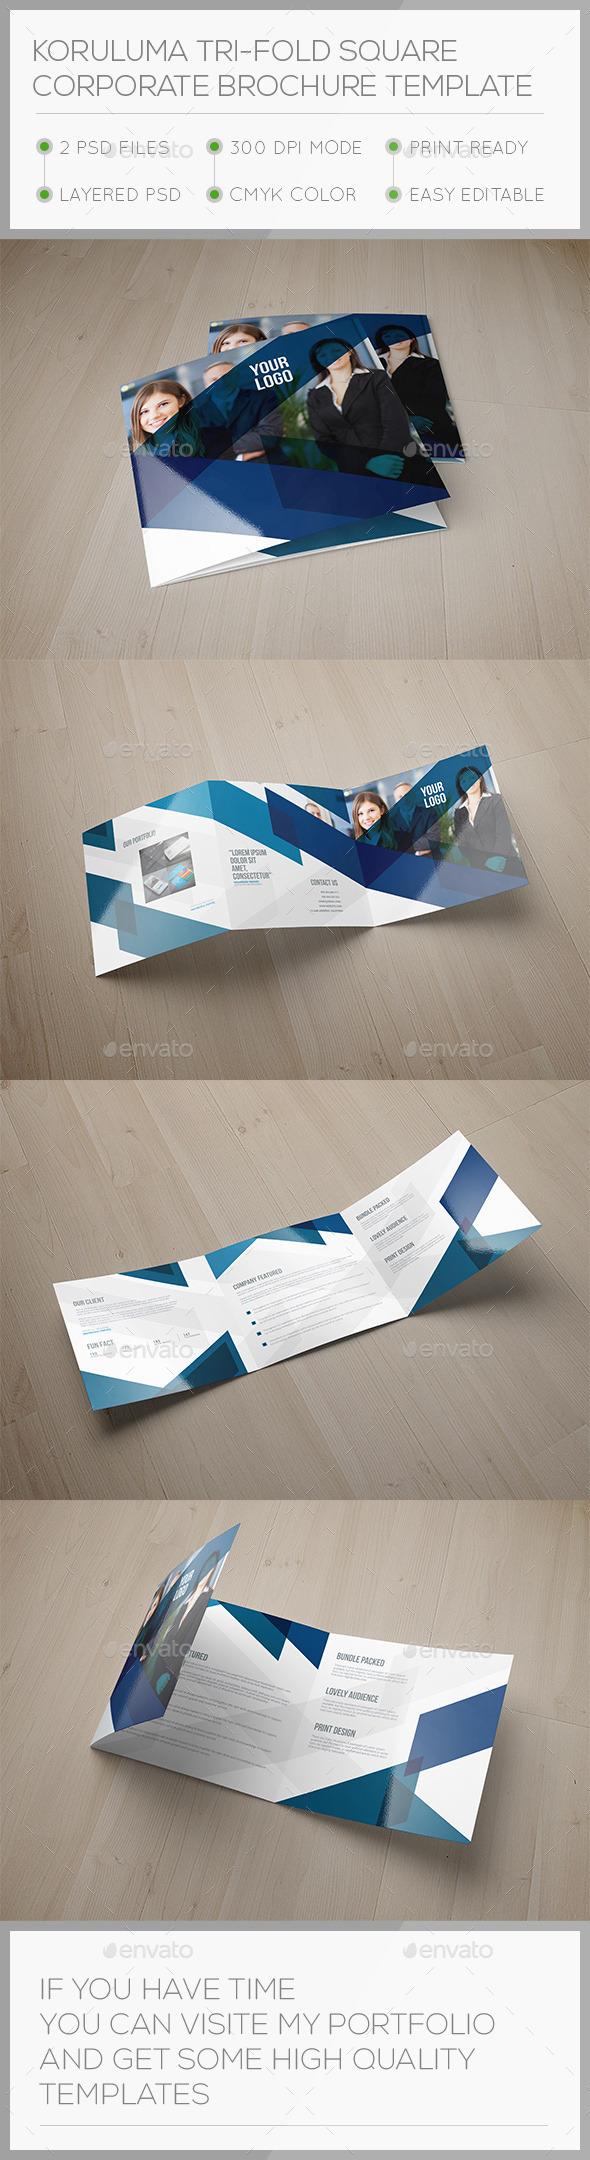 Korulum Tri-fold Square Brochure Template - Brochures Print Templates